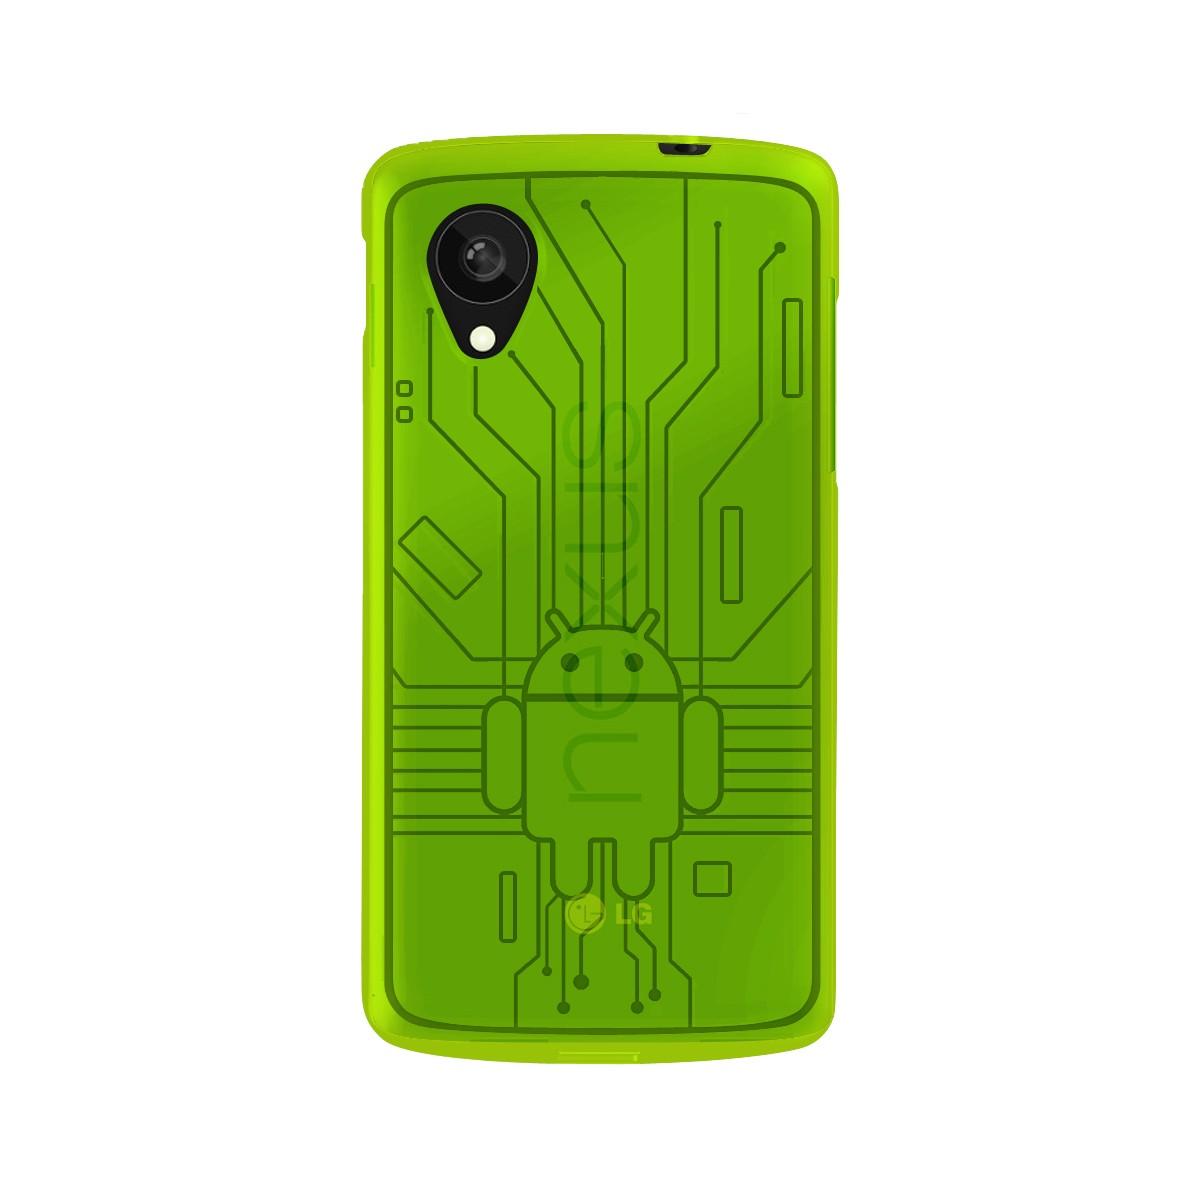 nexus5circuit-green_1